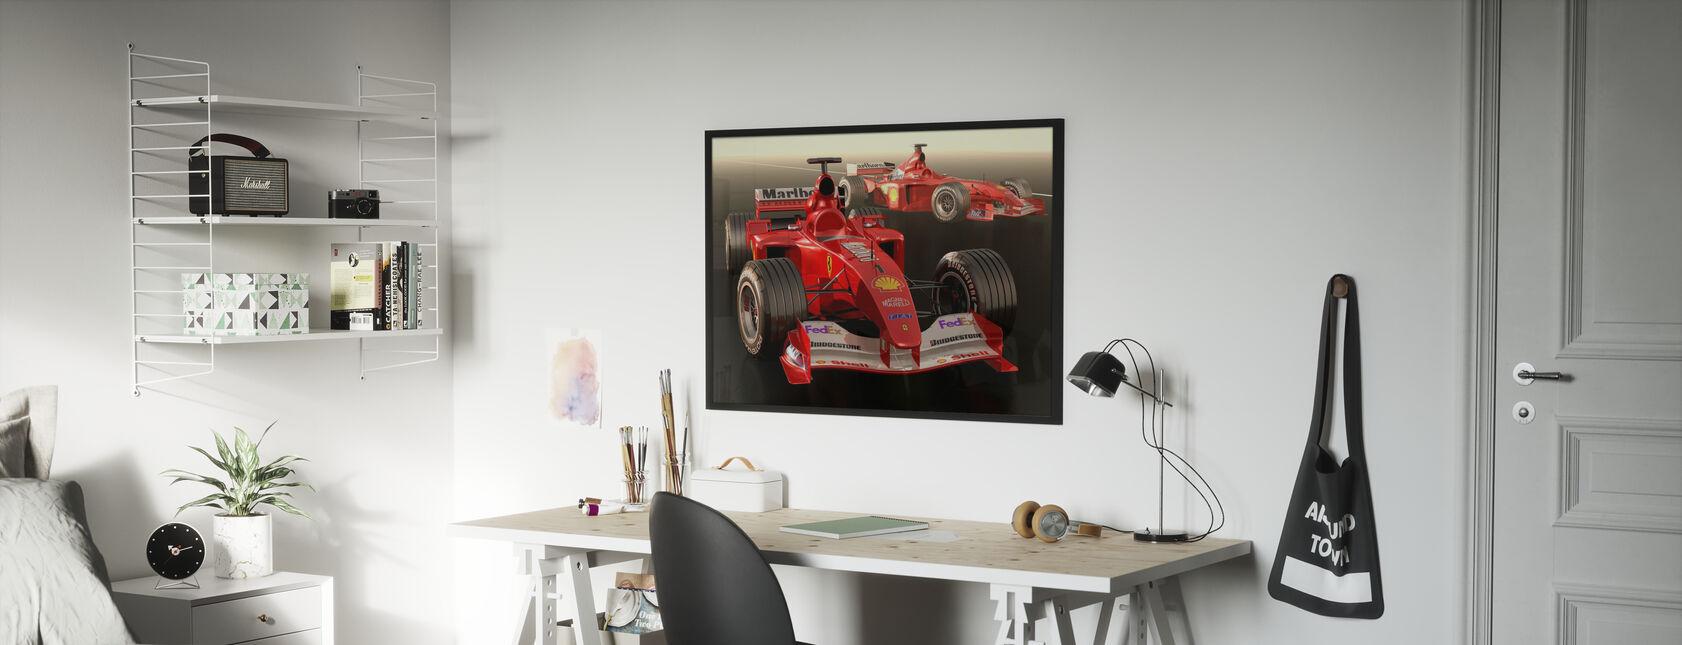 Klassisk Racing Bil - Innrammet bilde - Barnerom